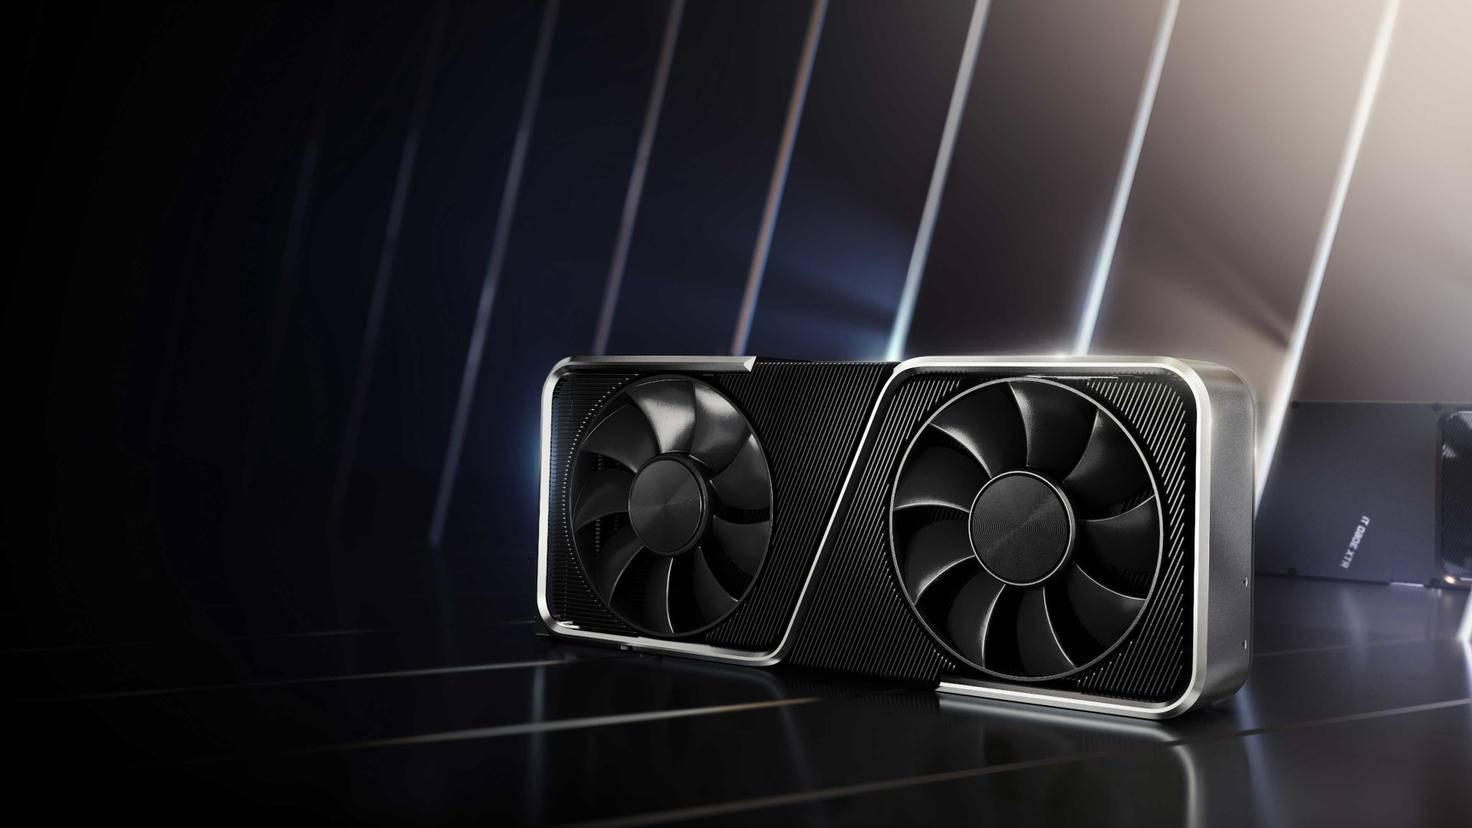 nvidia-geforce-rtx-3060-ti-key-visual